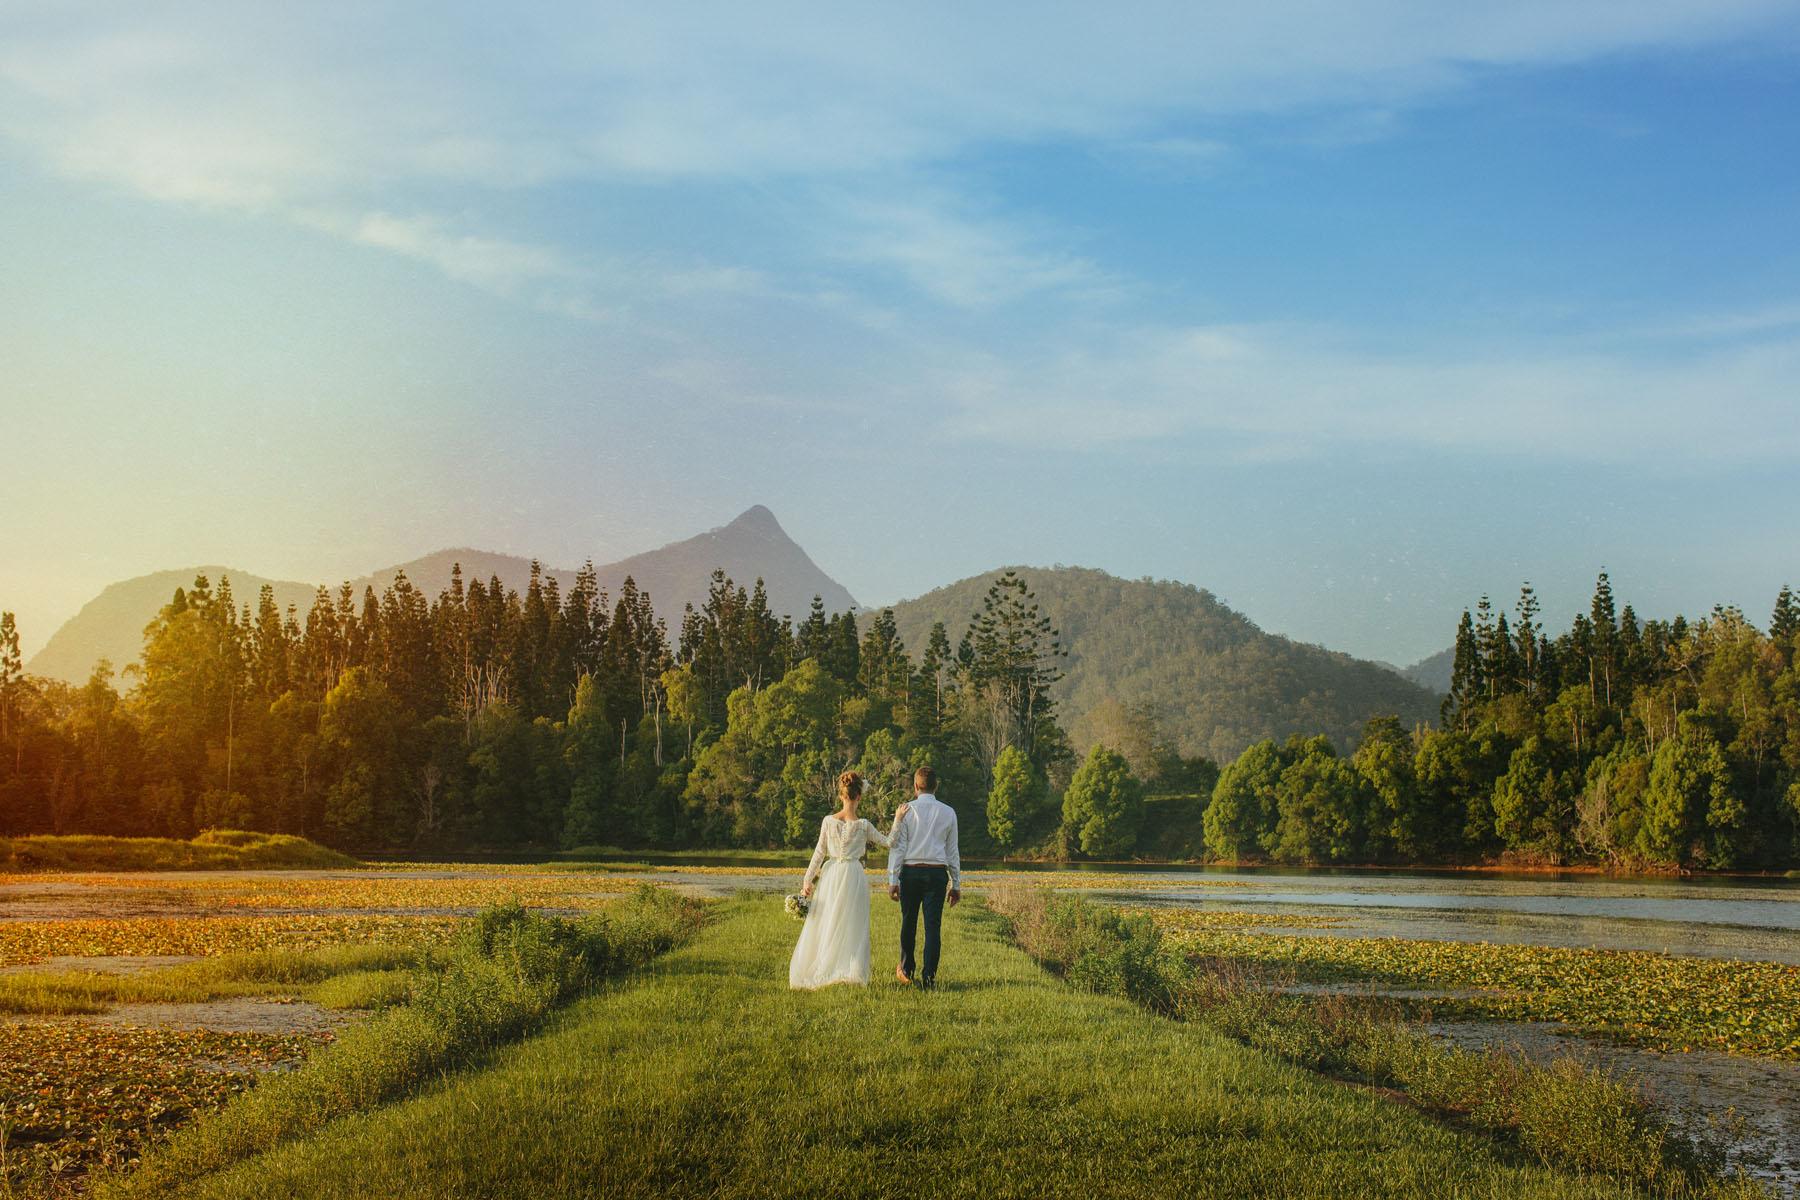 21_midginbill hill wedding .jpg